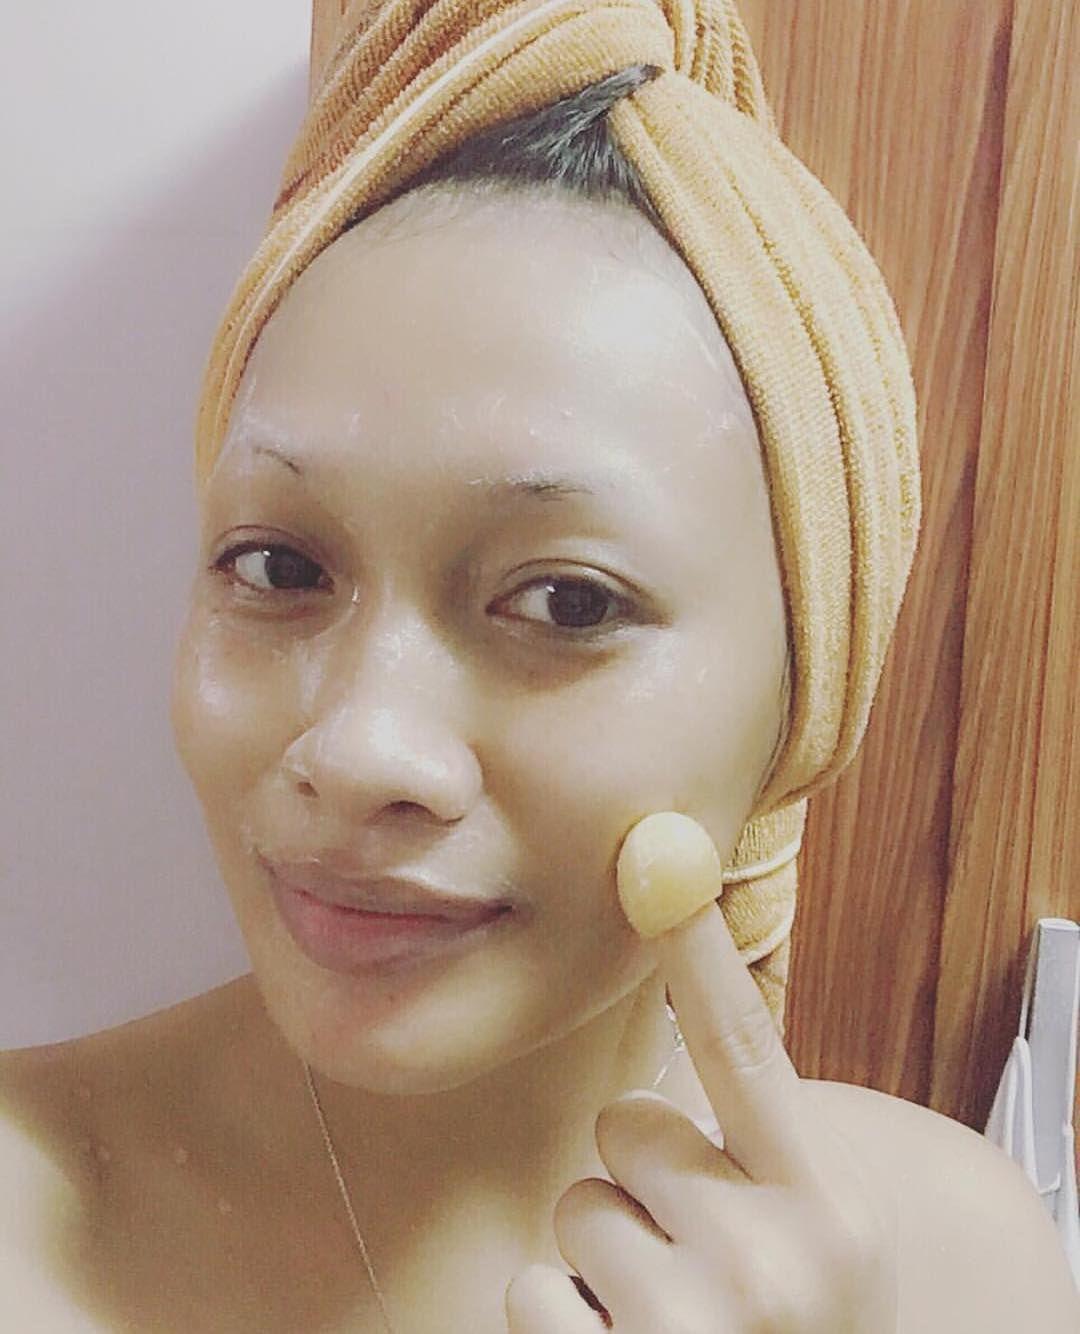 Korean Skin Care Secrets: 10 Korean Secrets To Make Your Skin Healthy And Shiny